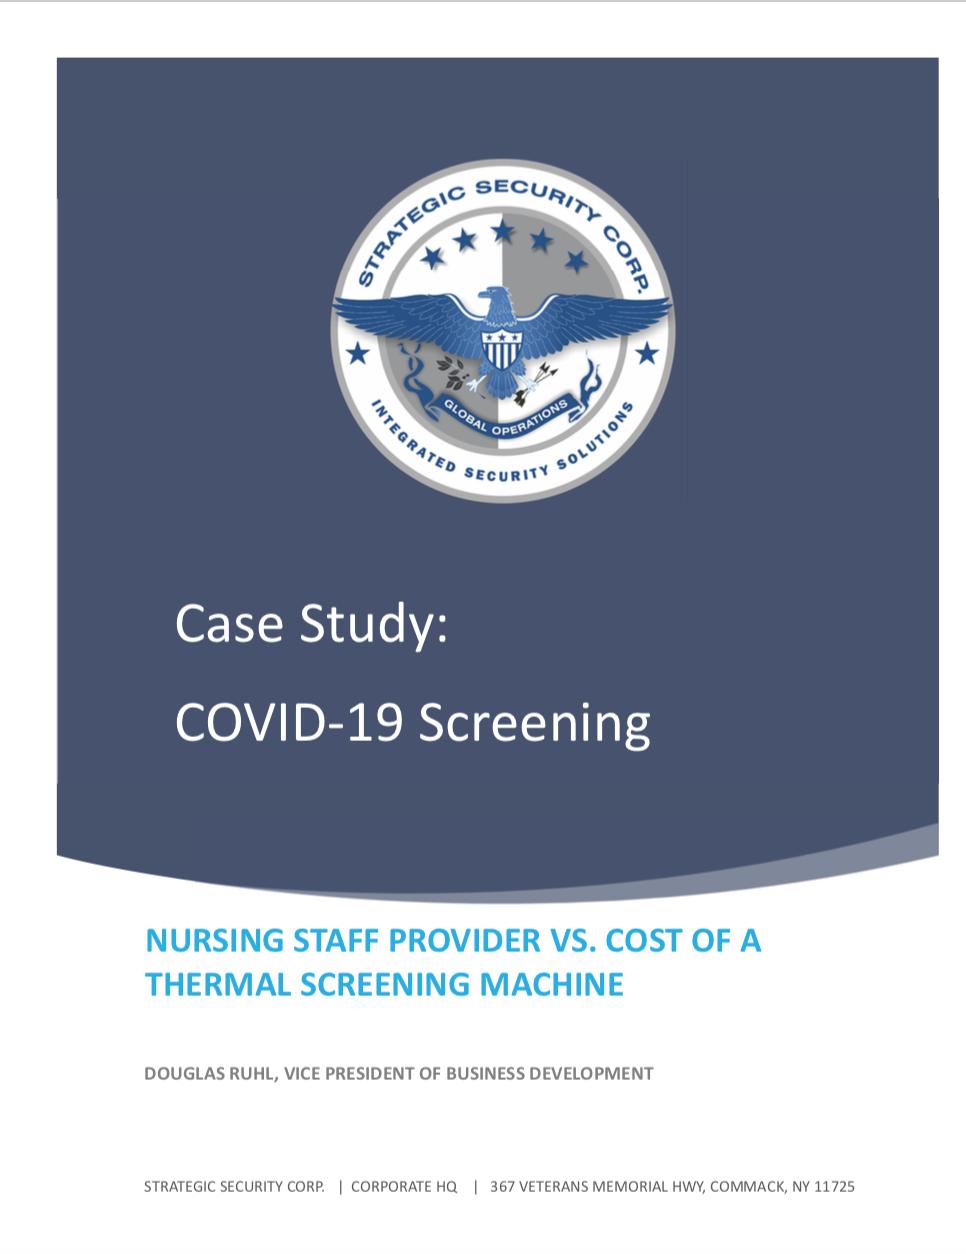 Case-Study-Thermal-Screening